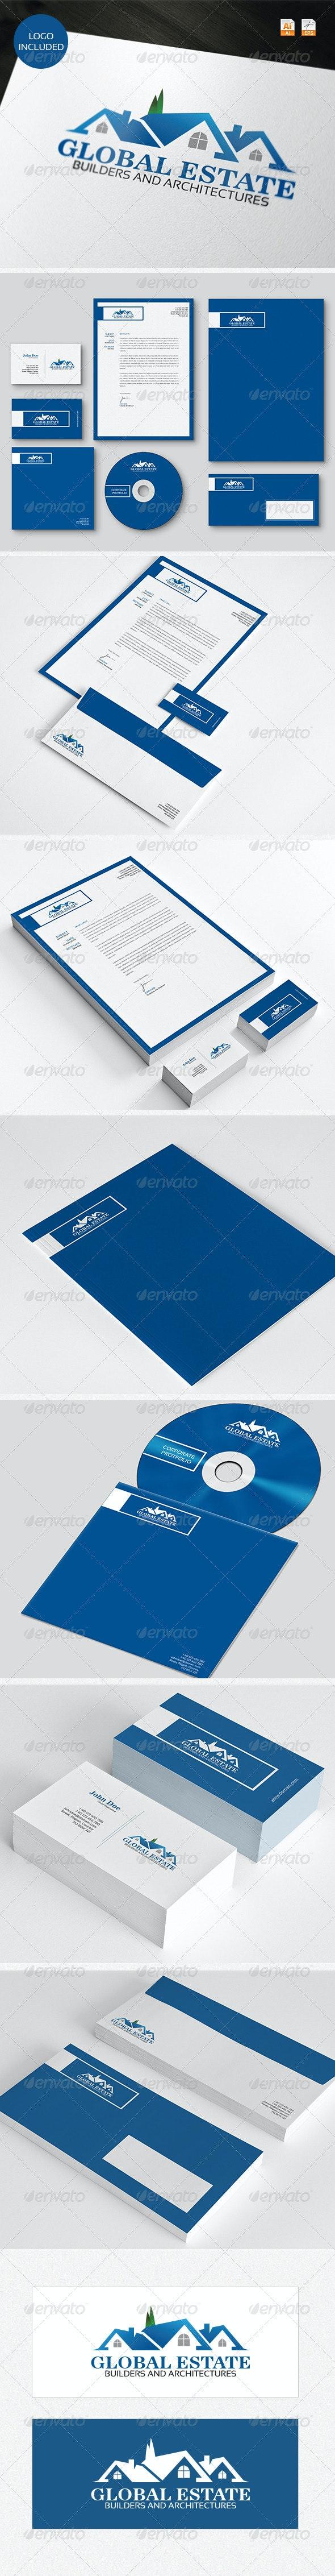 Global Estate Logo & Identity - Stationery Print Templates